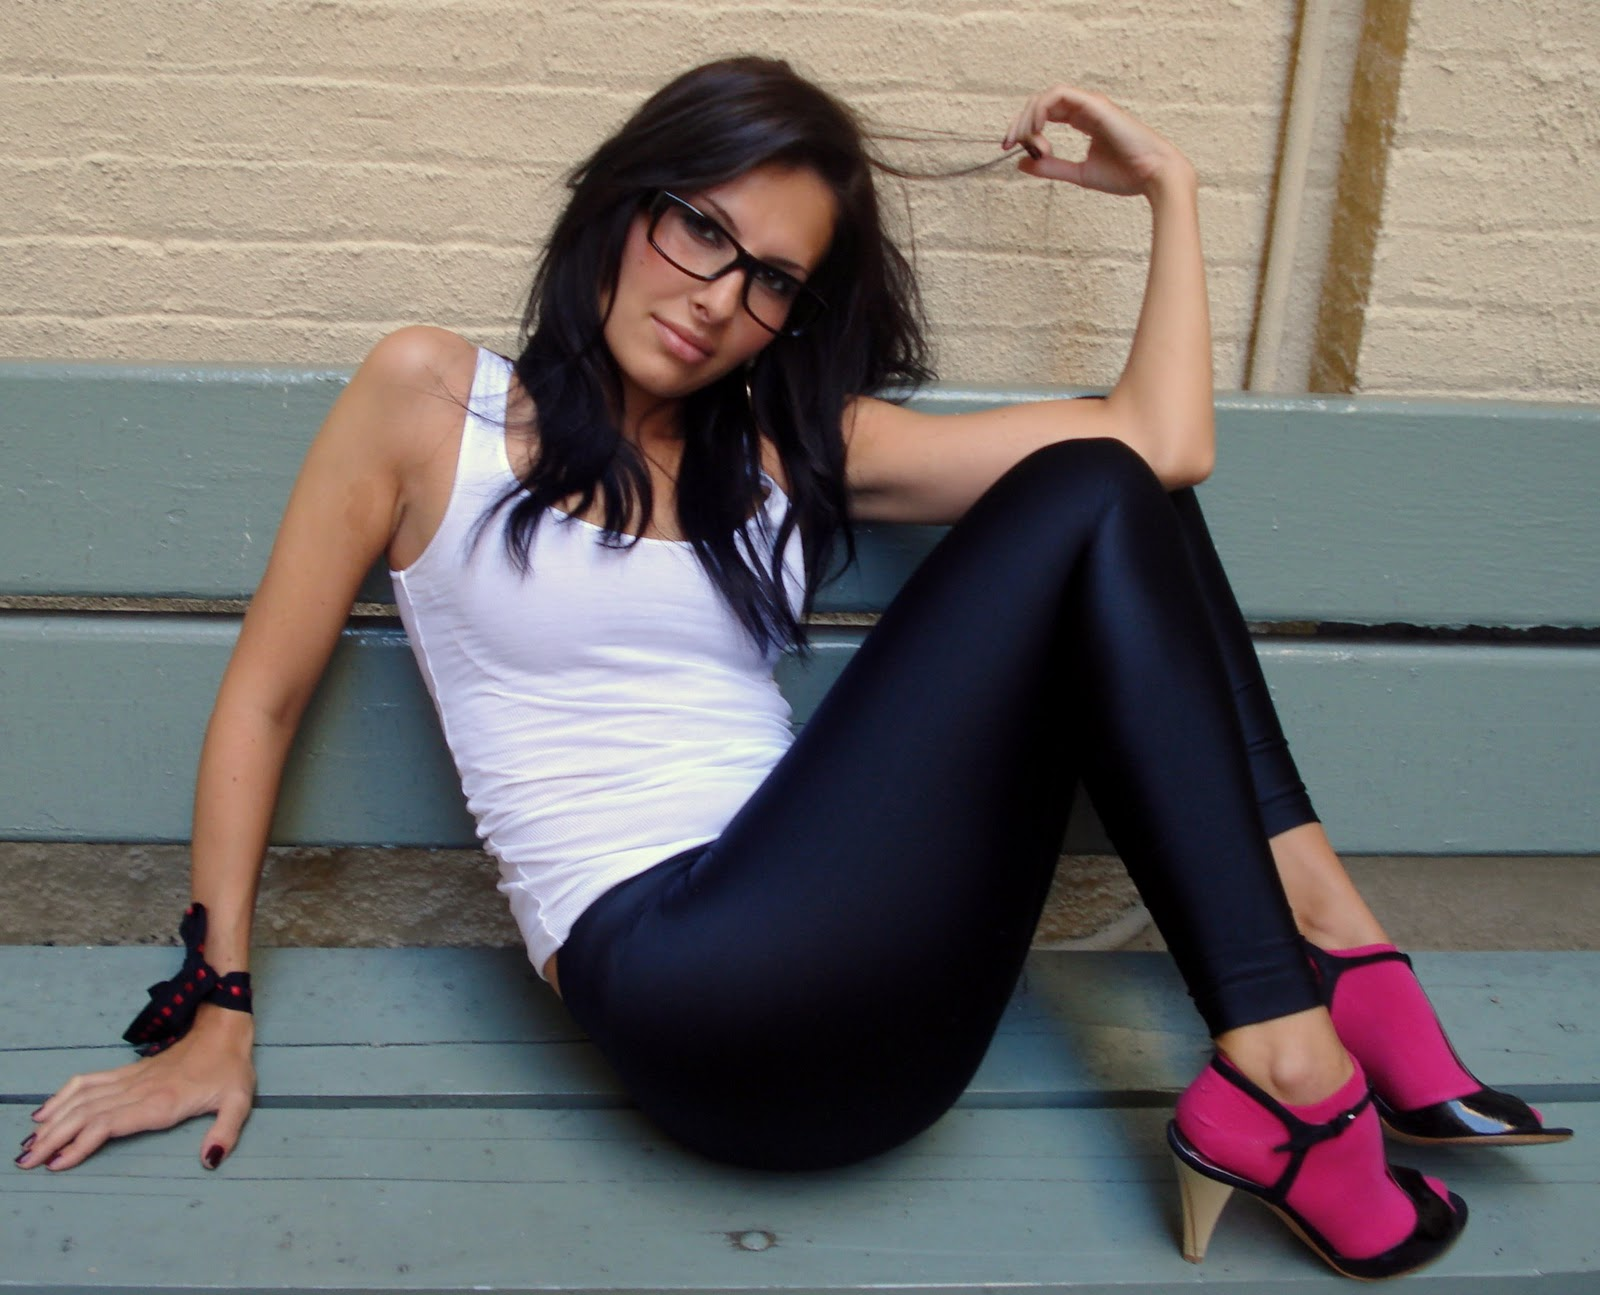 http://4.bp.blogspot.com/-RzPiy9JTWFE/TZAc2P1QUdI/AAAAAAAAAV0/ueZfBUf5kvo/s1600/yoga-girl-18.jpg